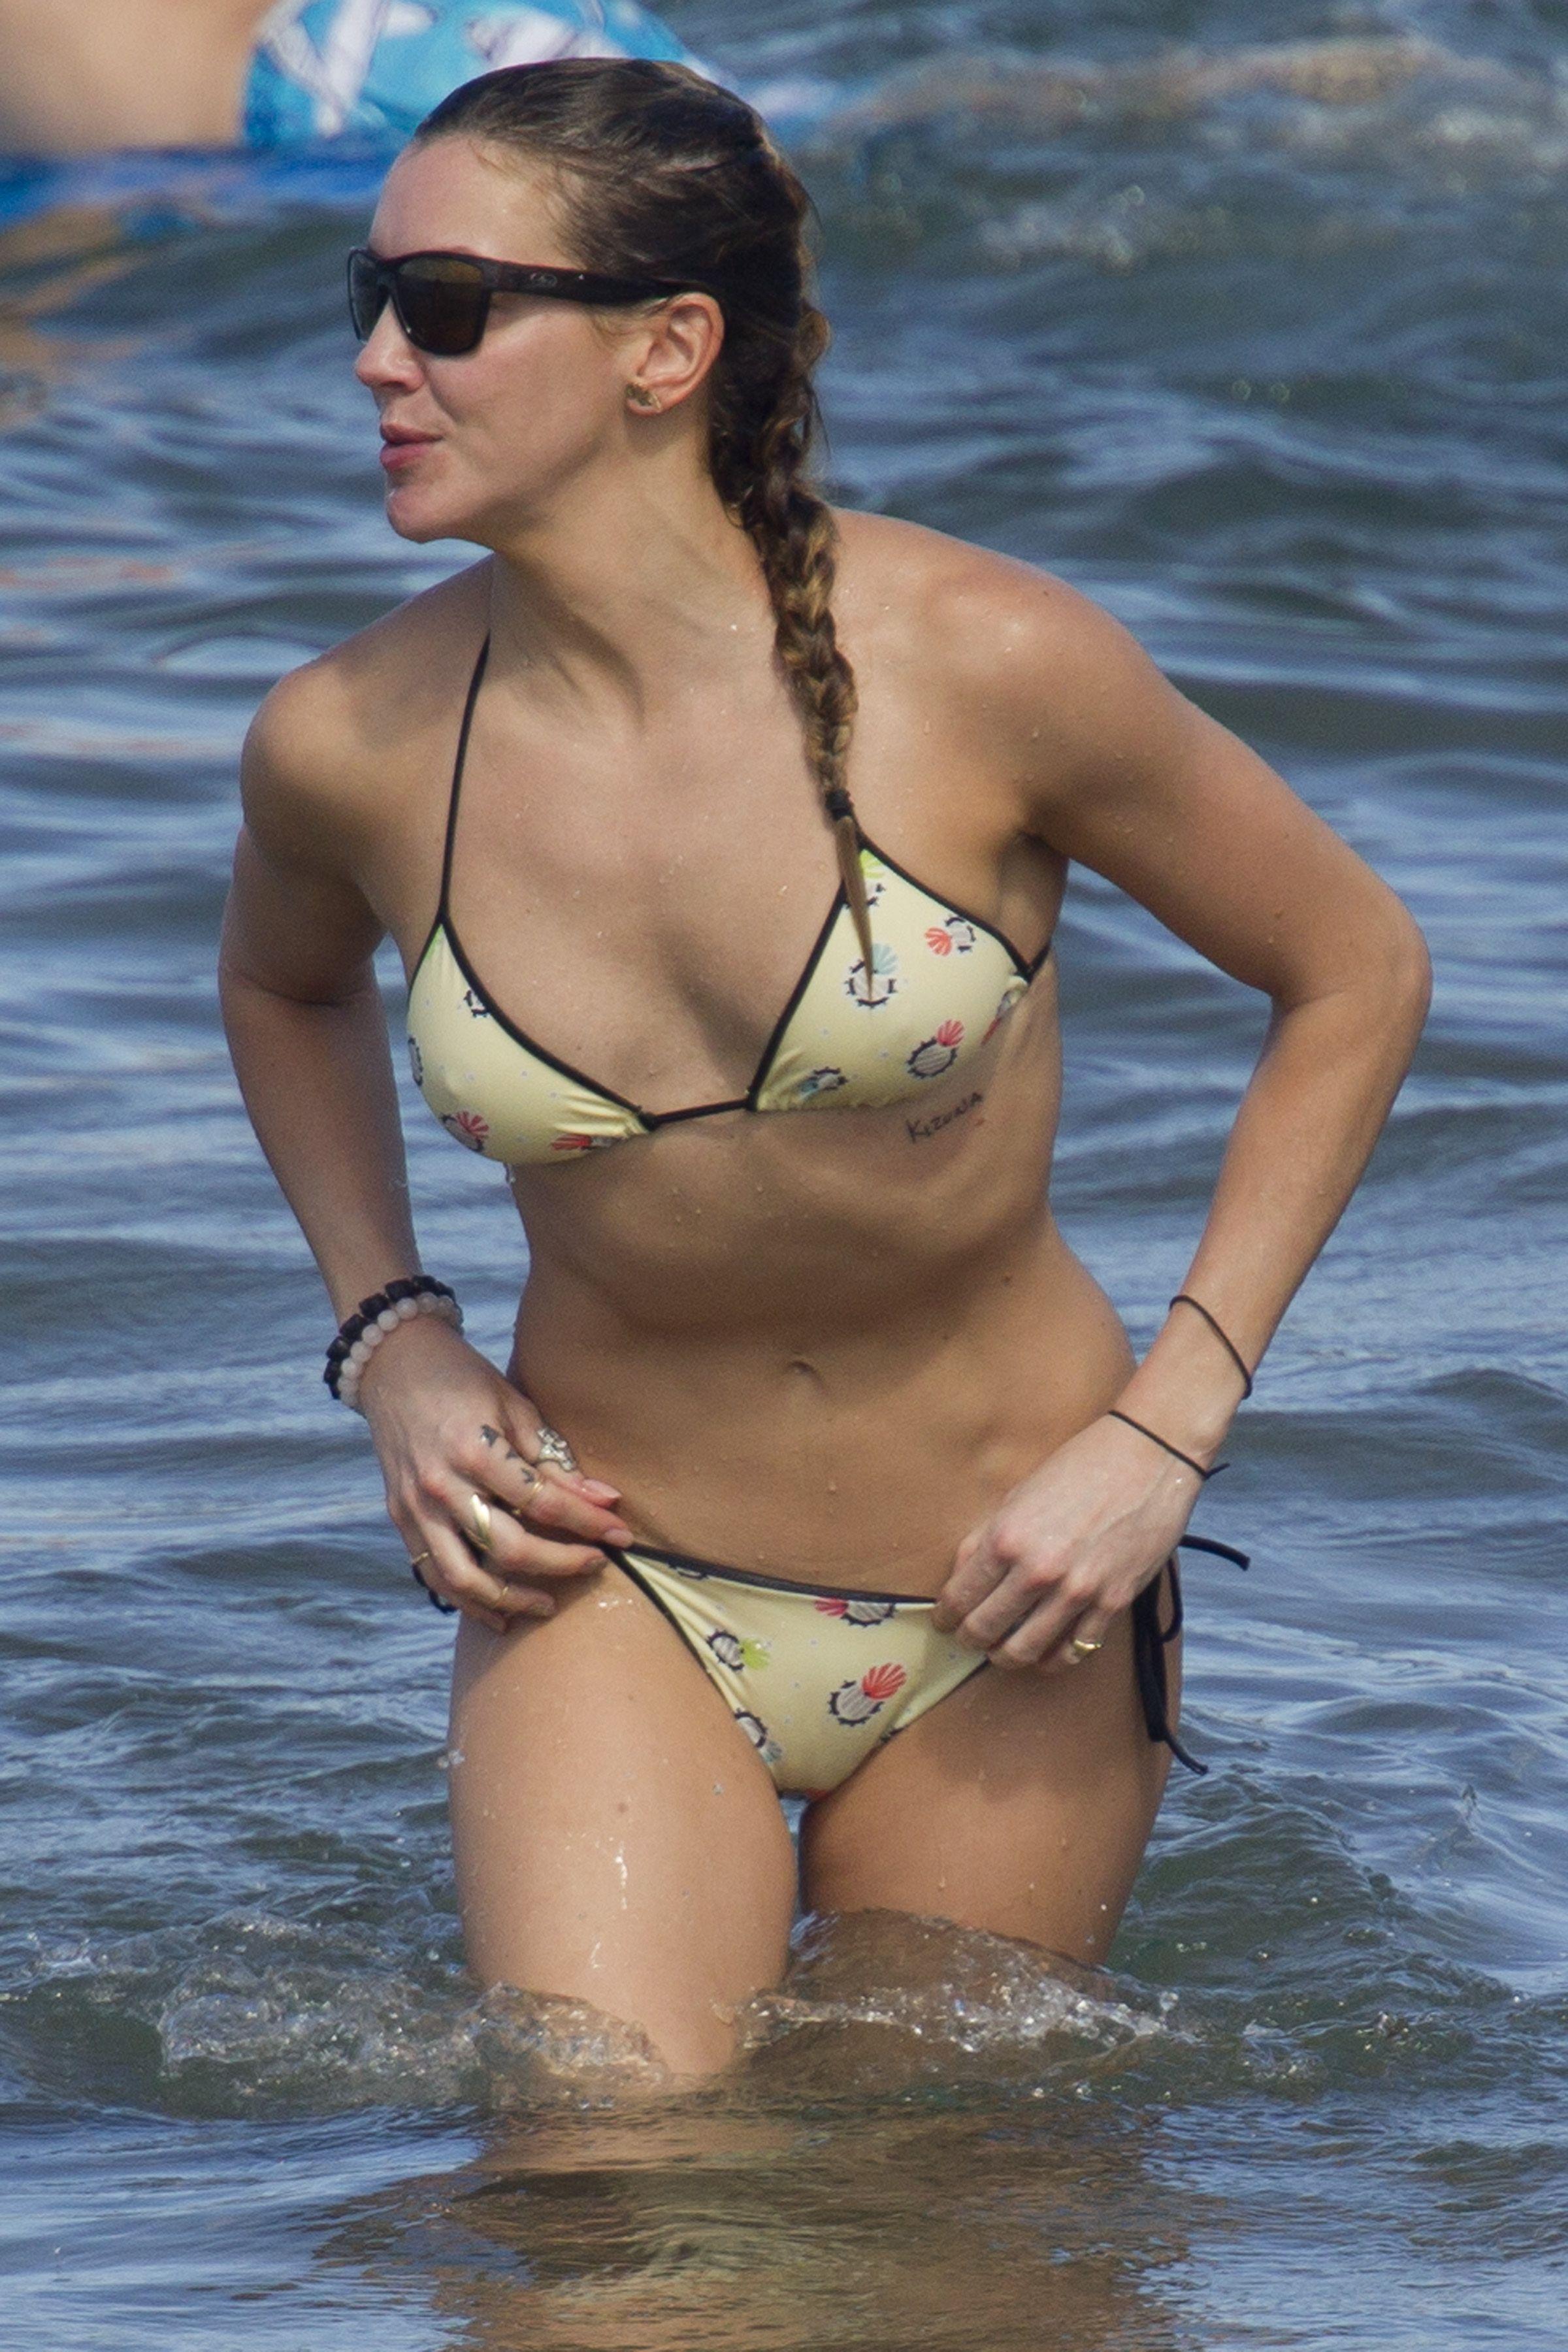 Katie-Cassidy-in-a-Bikini-118